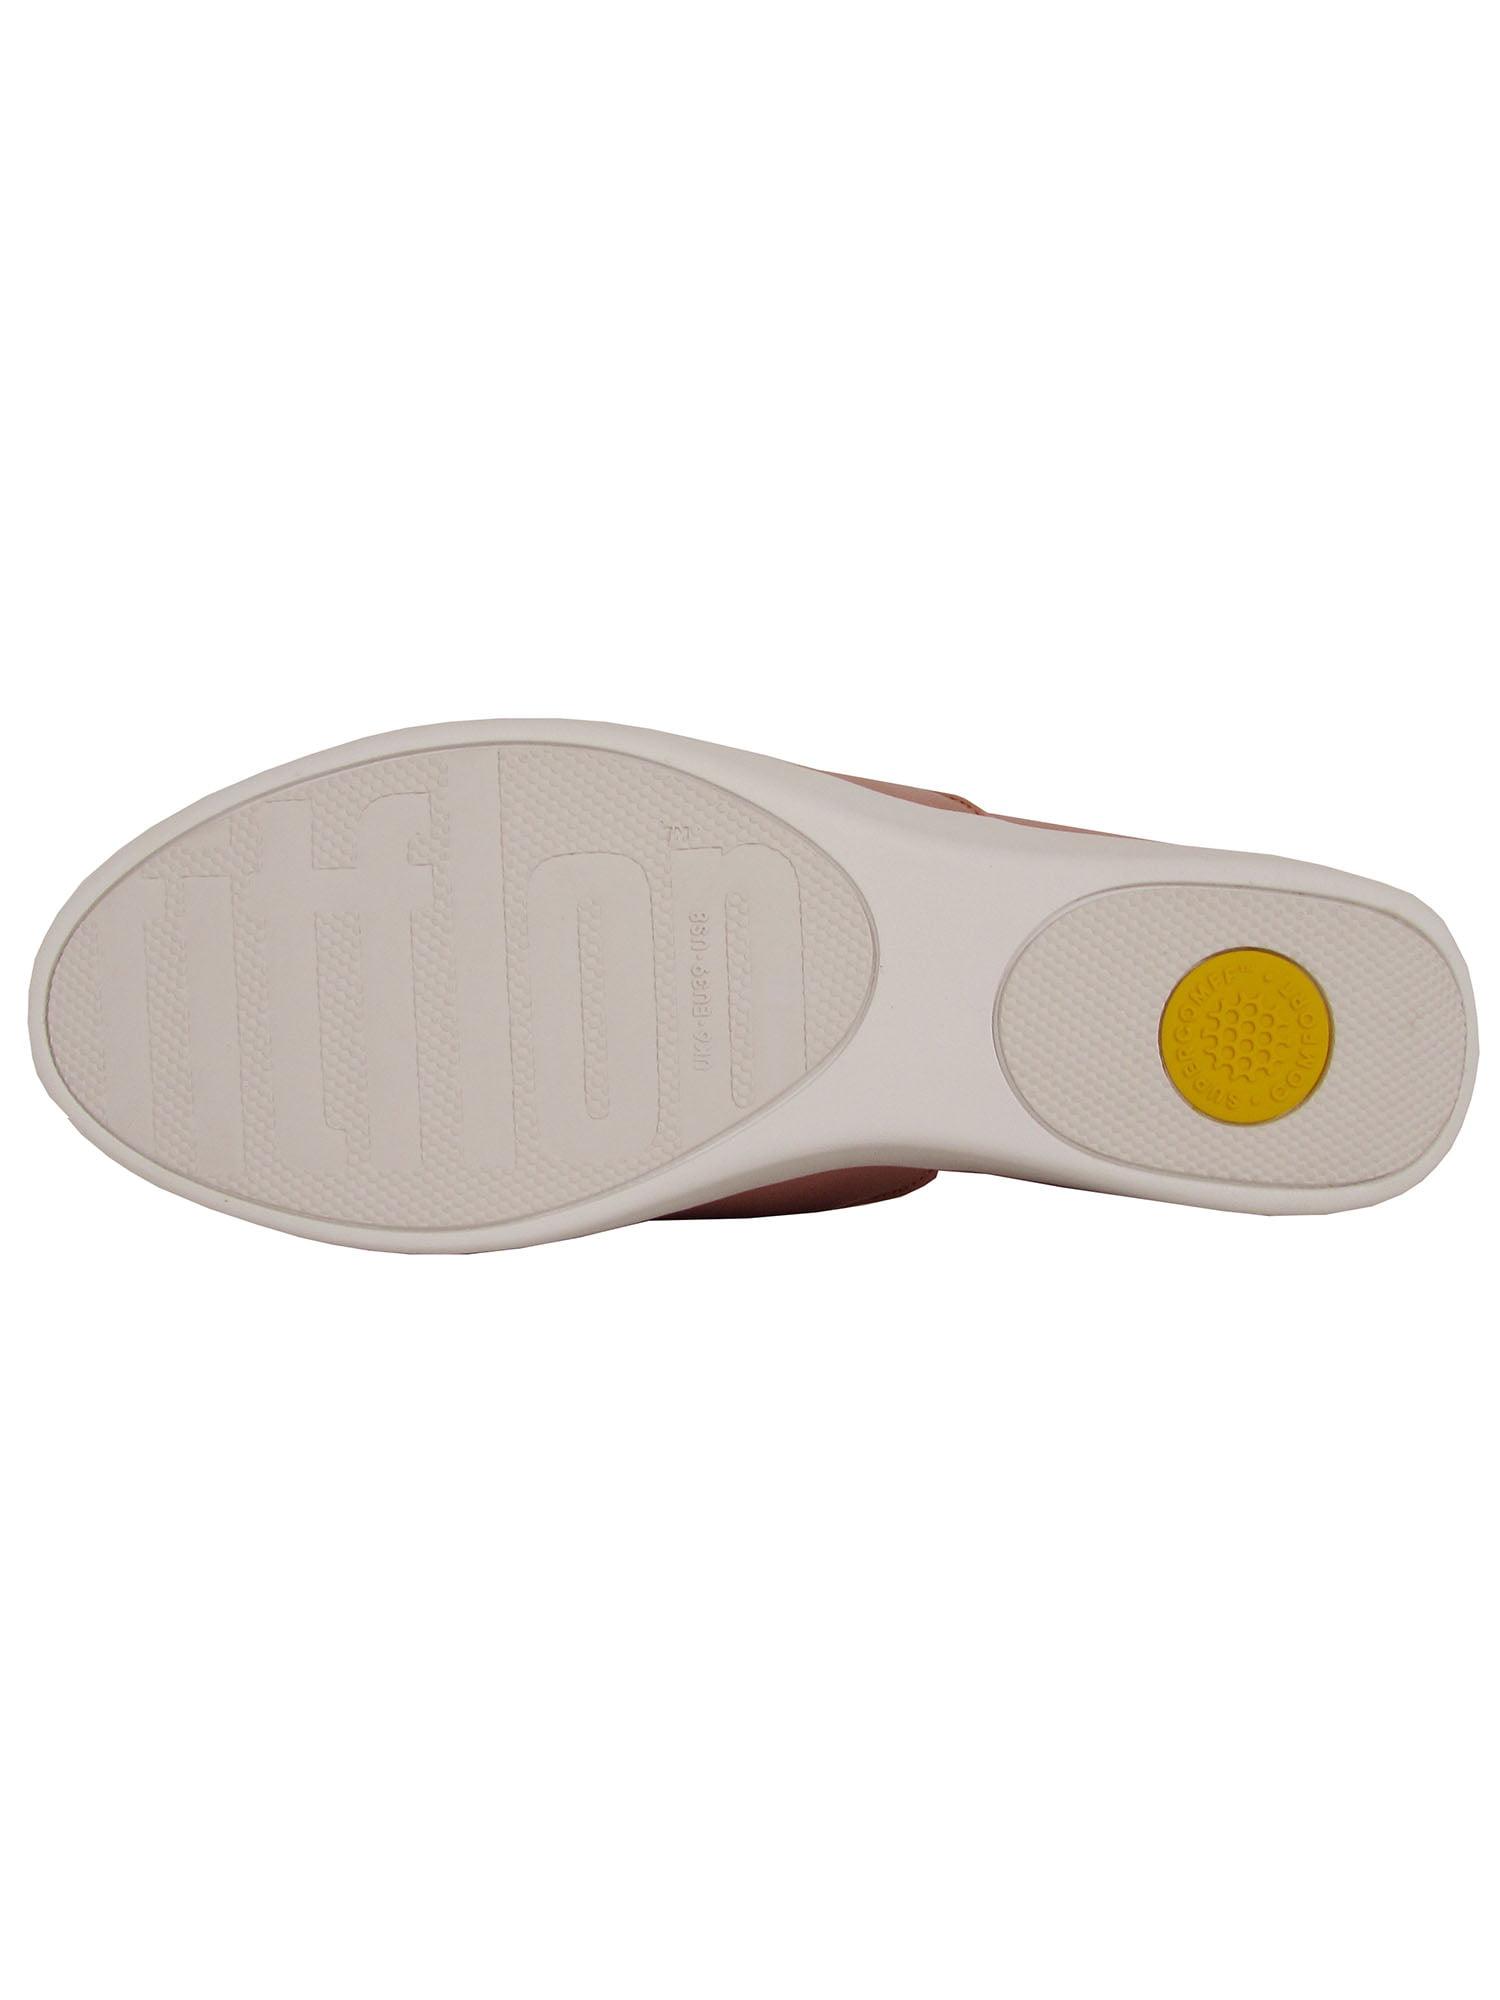 FitFlop Womens Tassel D'orsay Superskate D'orsay Tassel Loafer Shoes 59e610